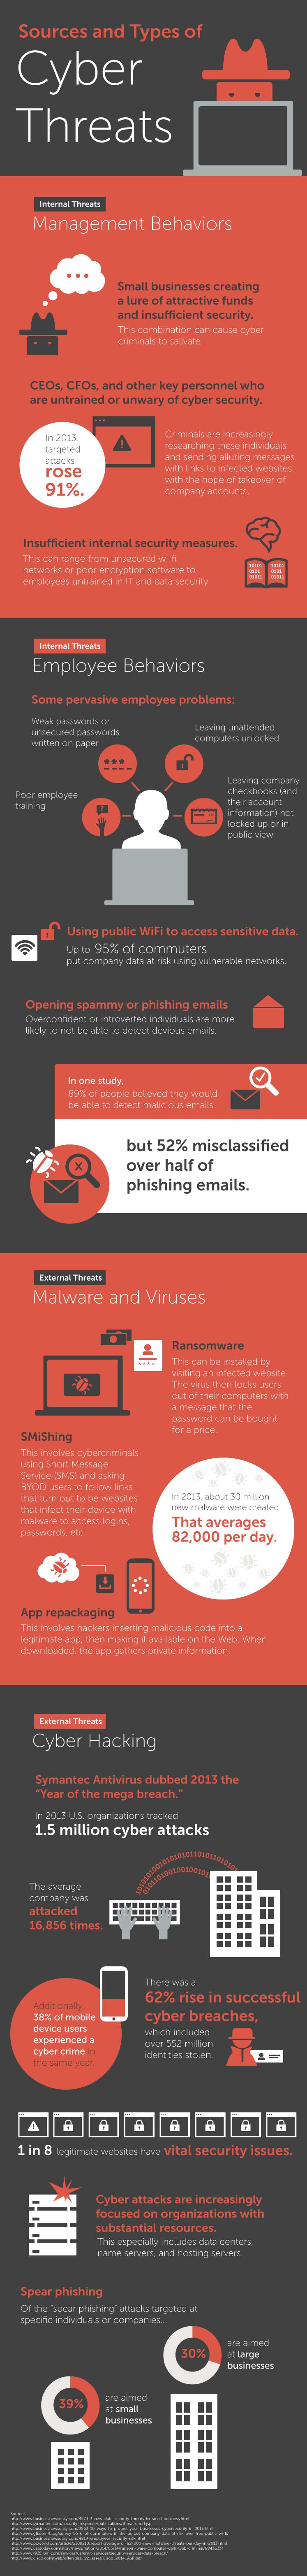 Cyber-Threats